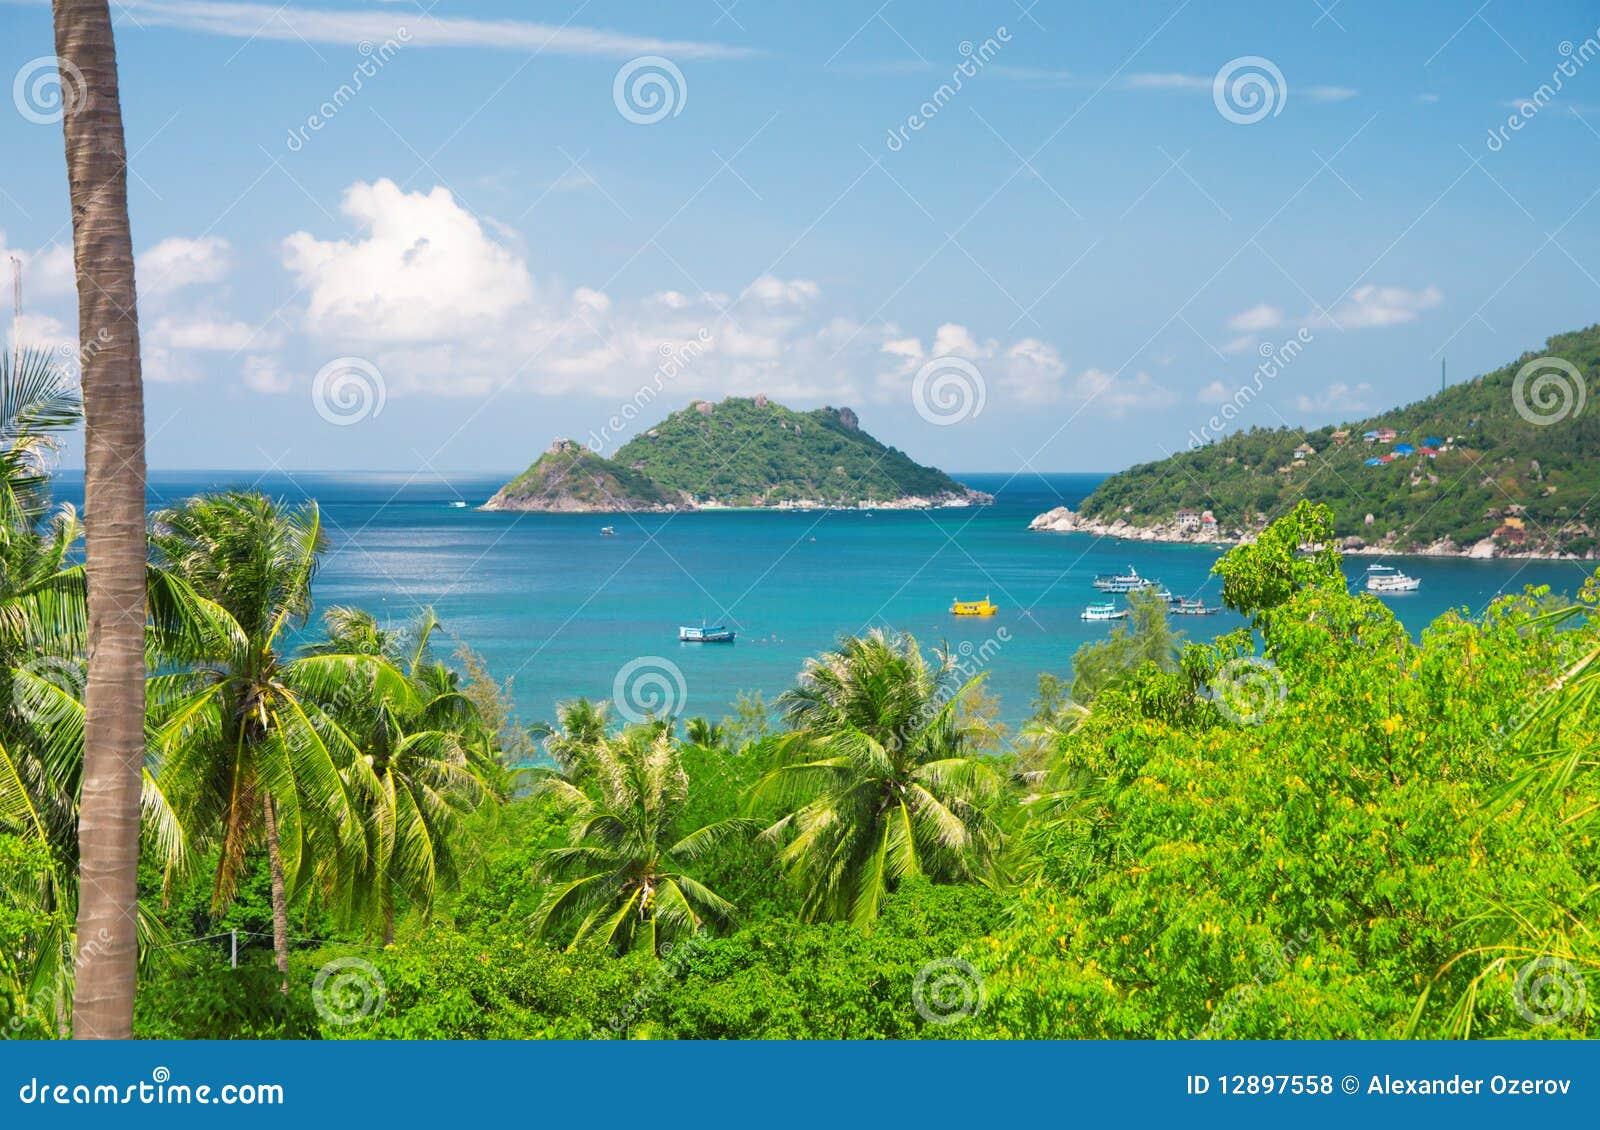 Sea And Jungle  Beautiful Ko Tao Island  Thailand Stock